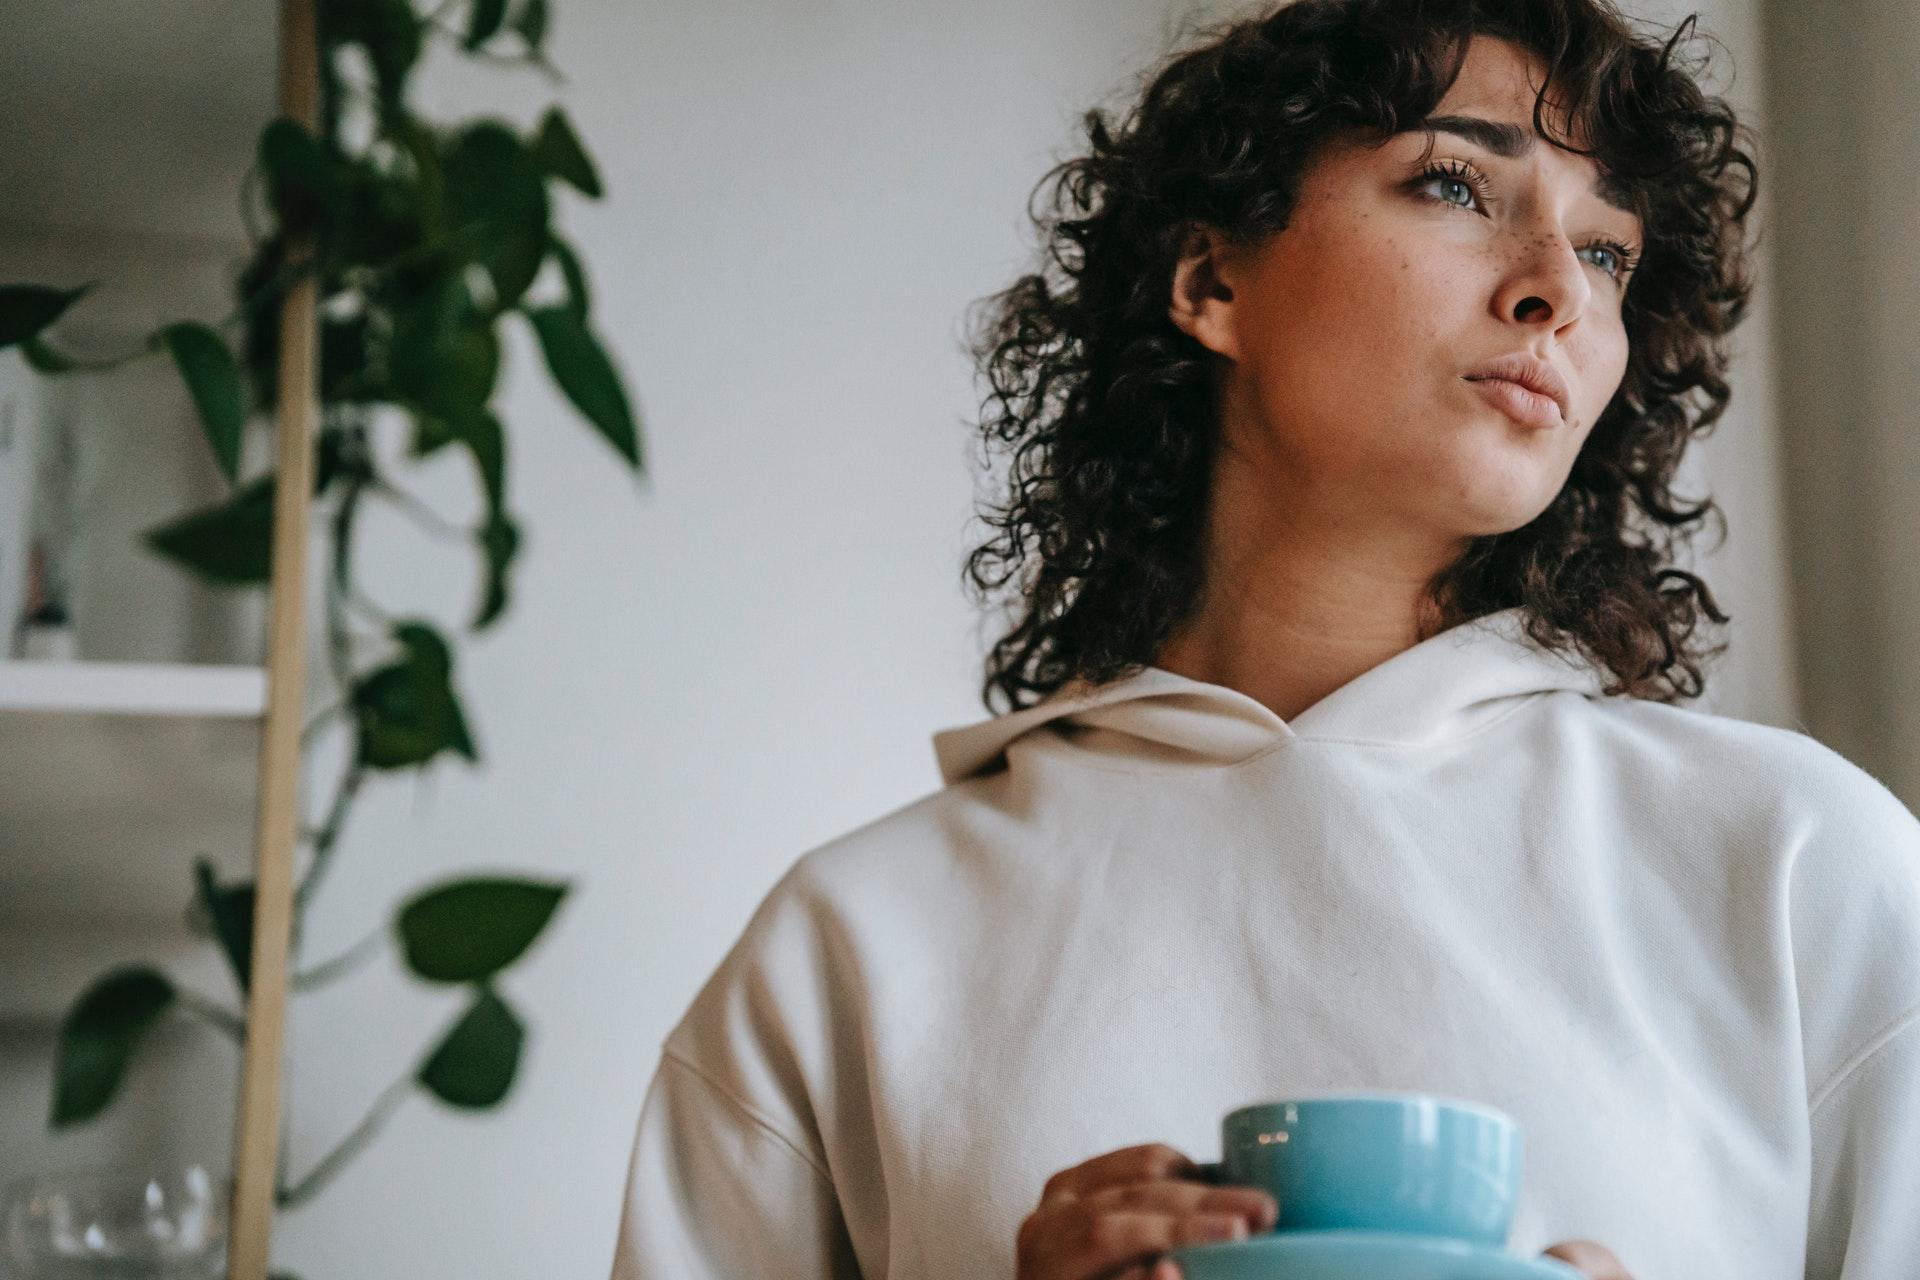 How Do I Know If I Have Bowel Cancer?